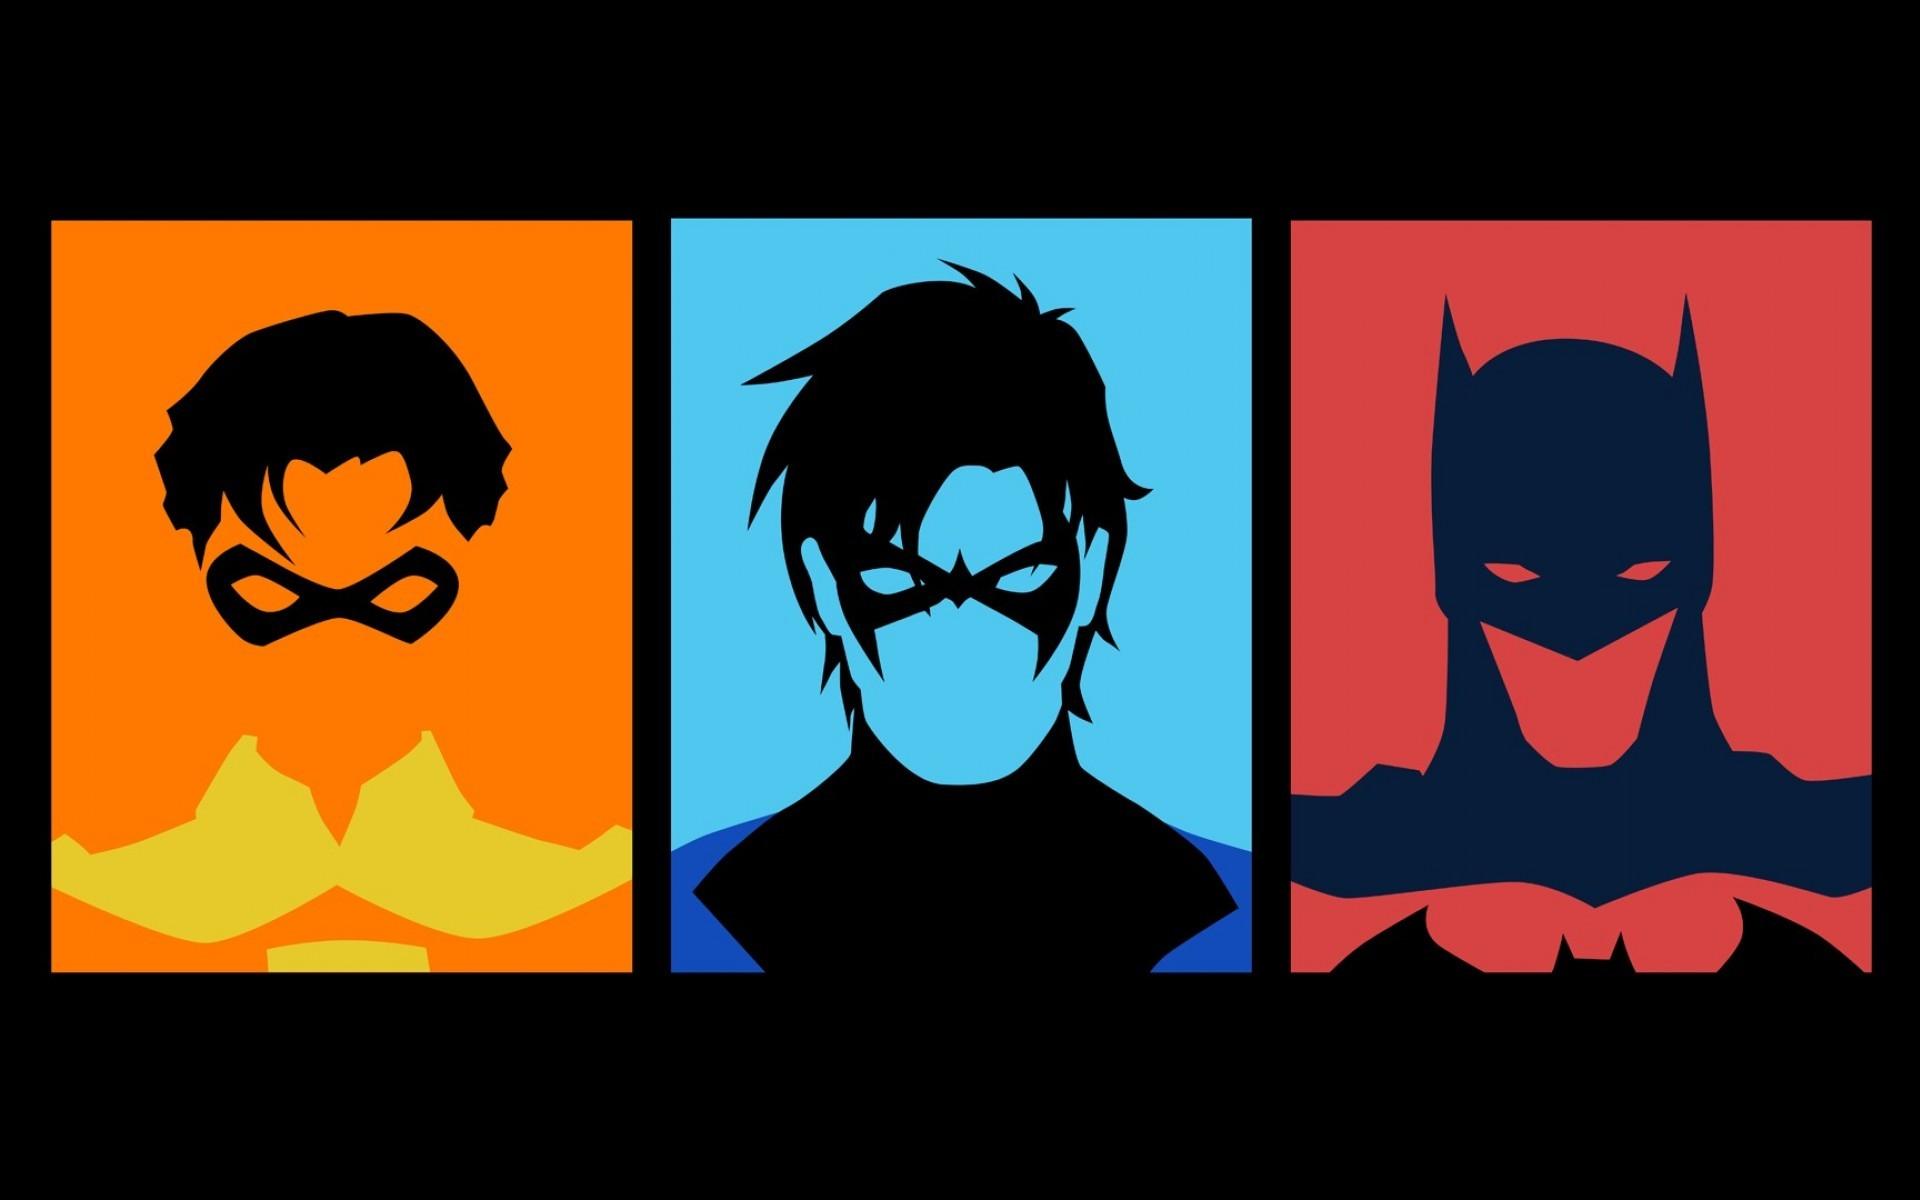 1920x1200 Batman, Robin, Minimalistic, Dc Comics, Superheroes, Nightwing